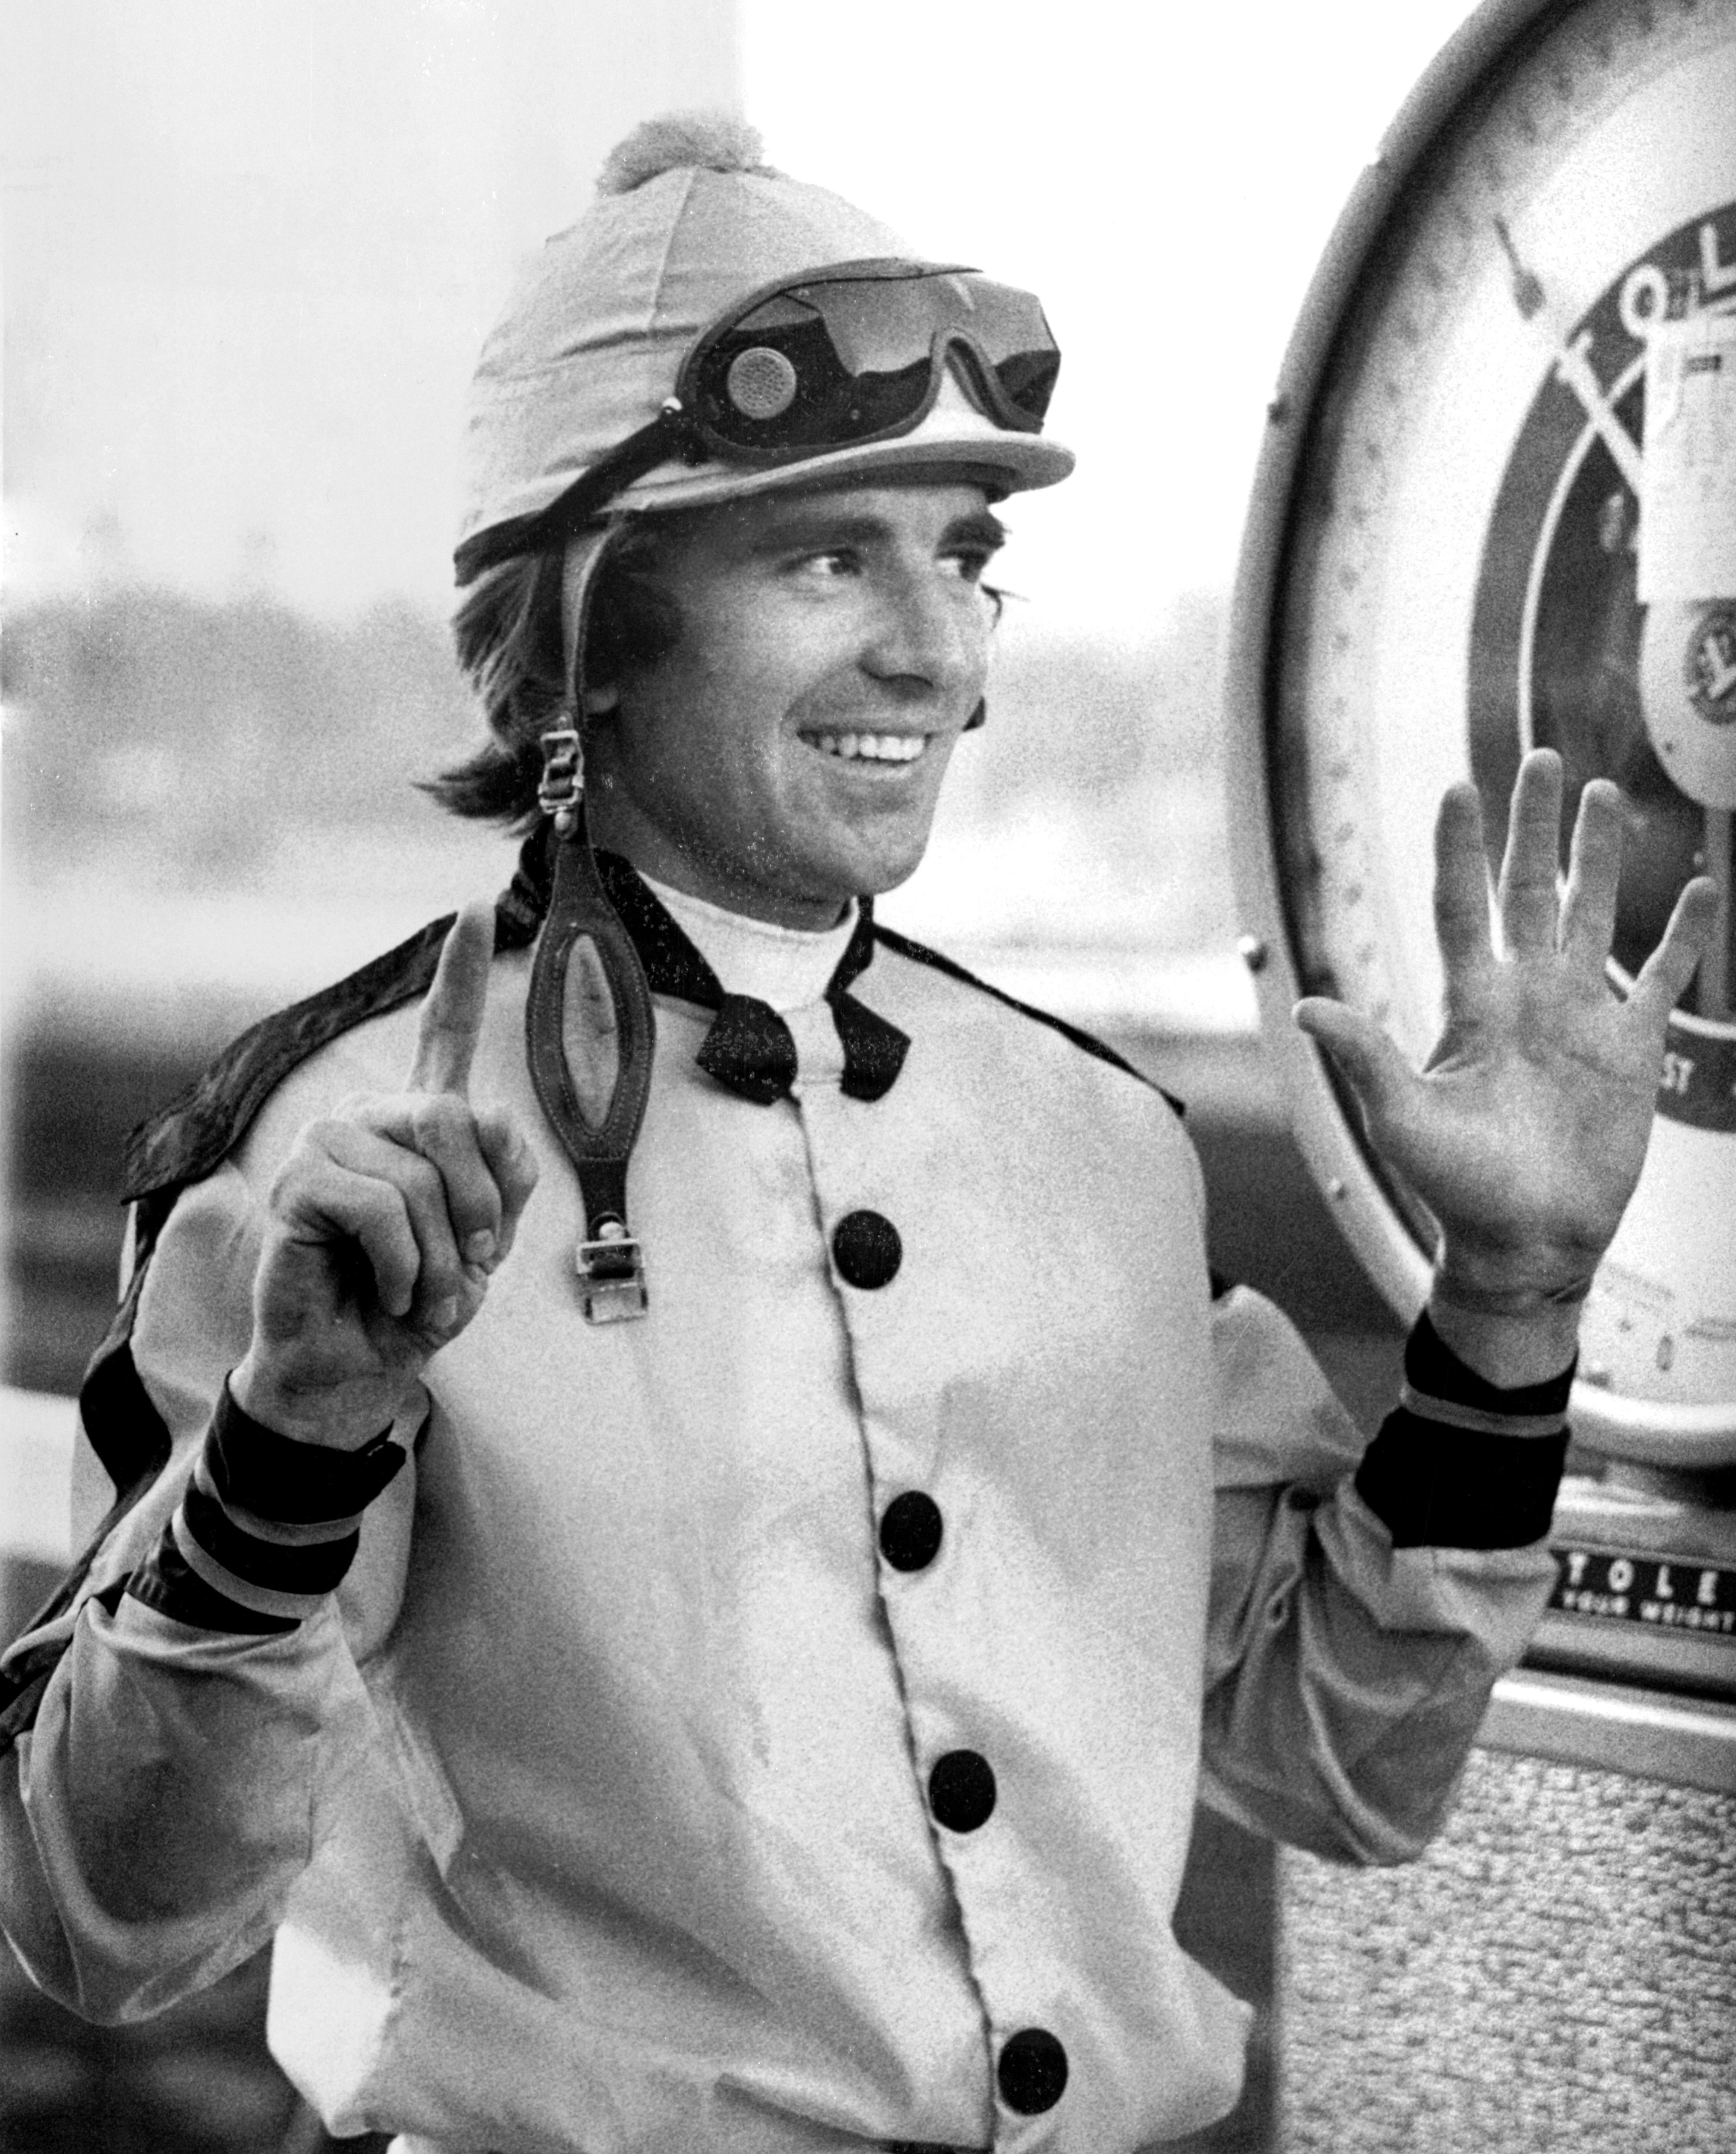 Darrel McHargue at Santa Anita (Keeneland Library Thoroughbred Times Collection)